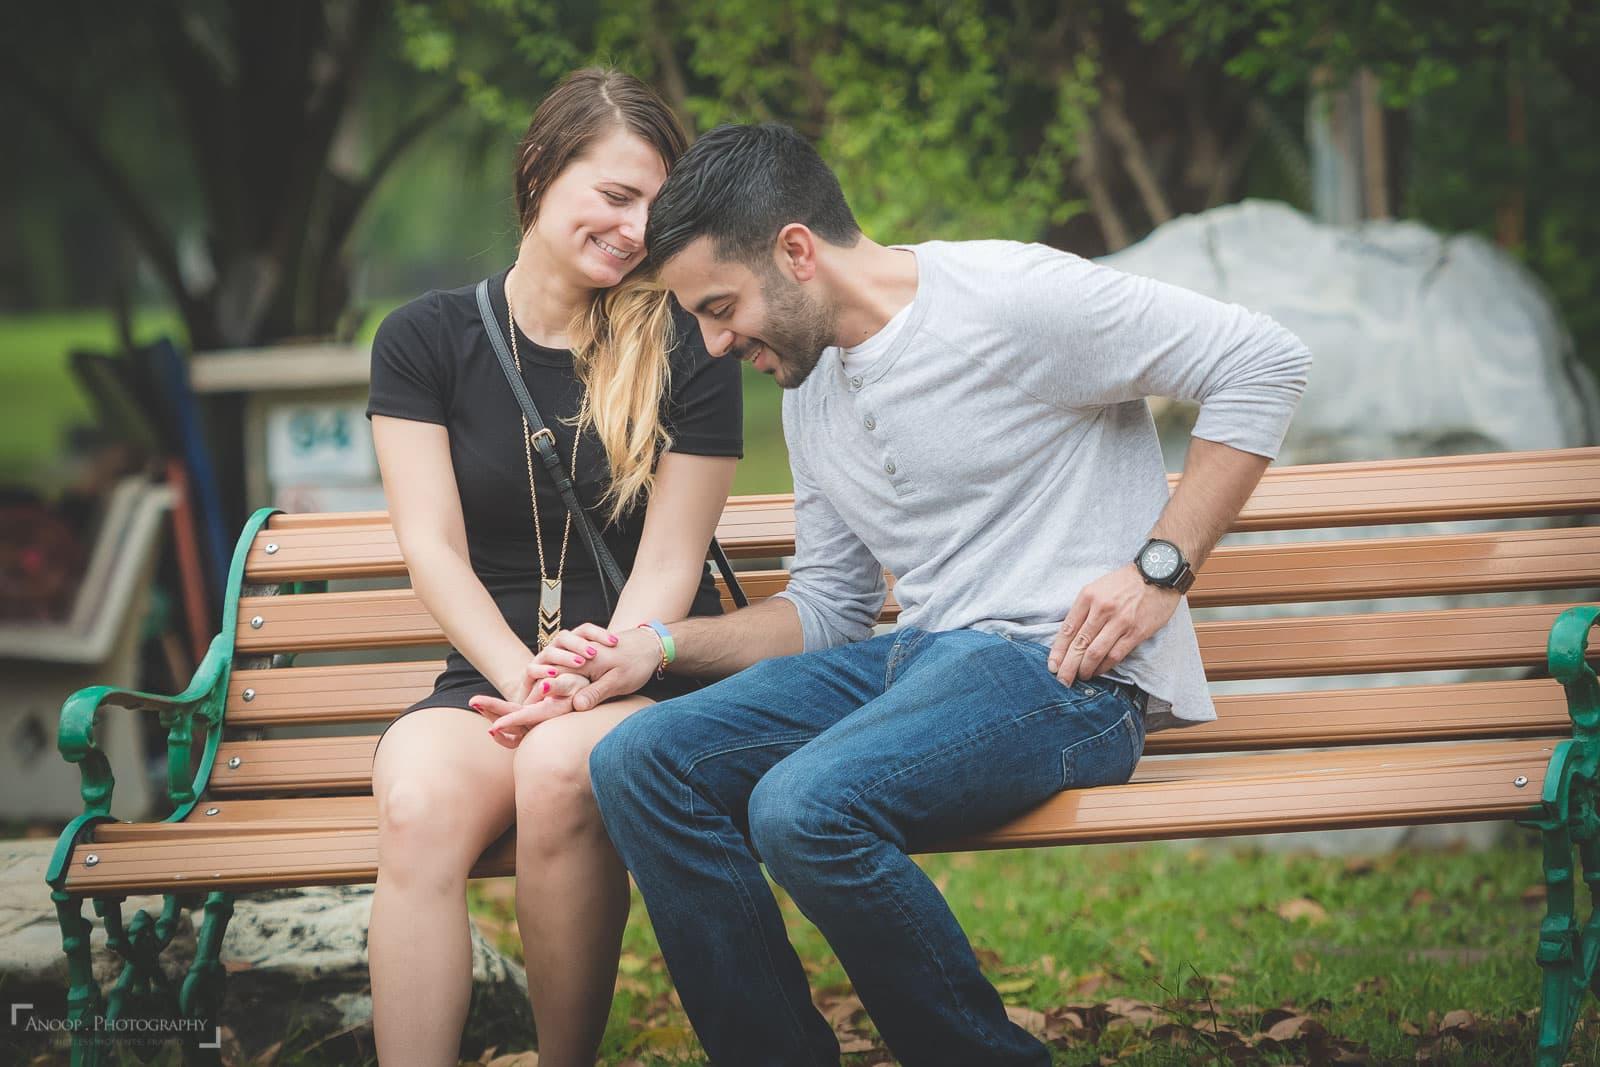 surprise-proposal-photography-thailand-marriage-proposal-ideas-photos11